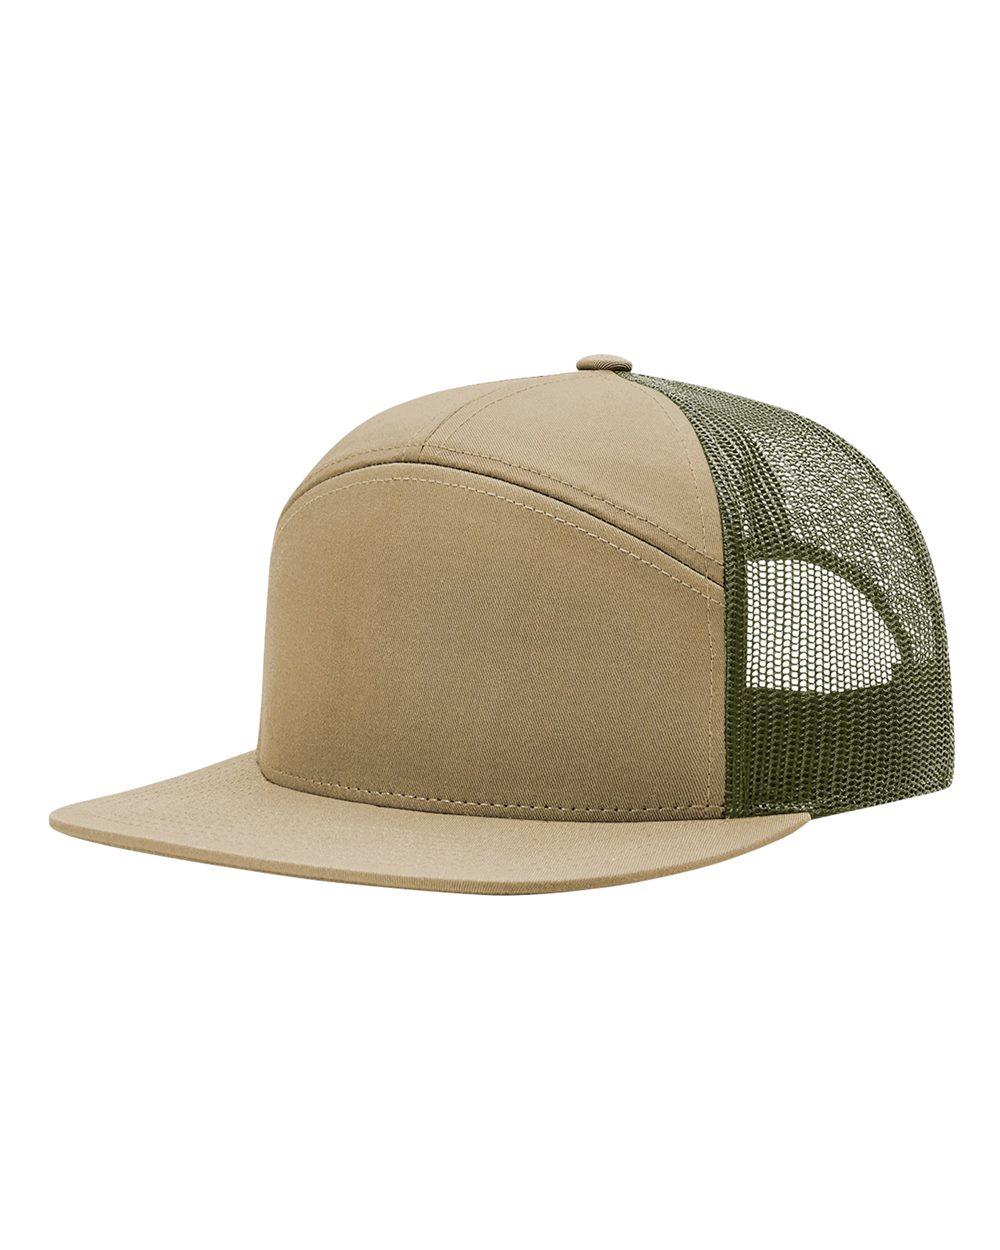 click to view Pale Khaki/ Loden Green